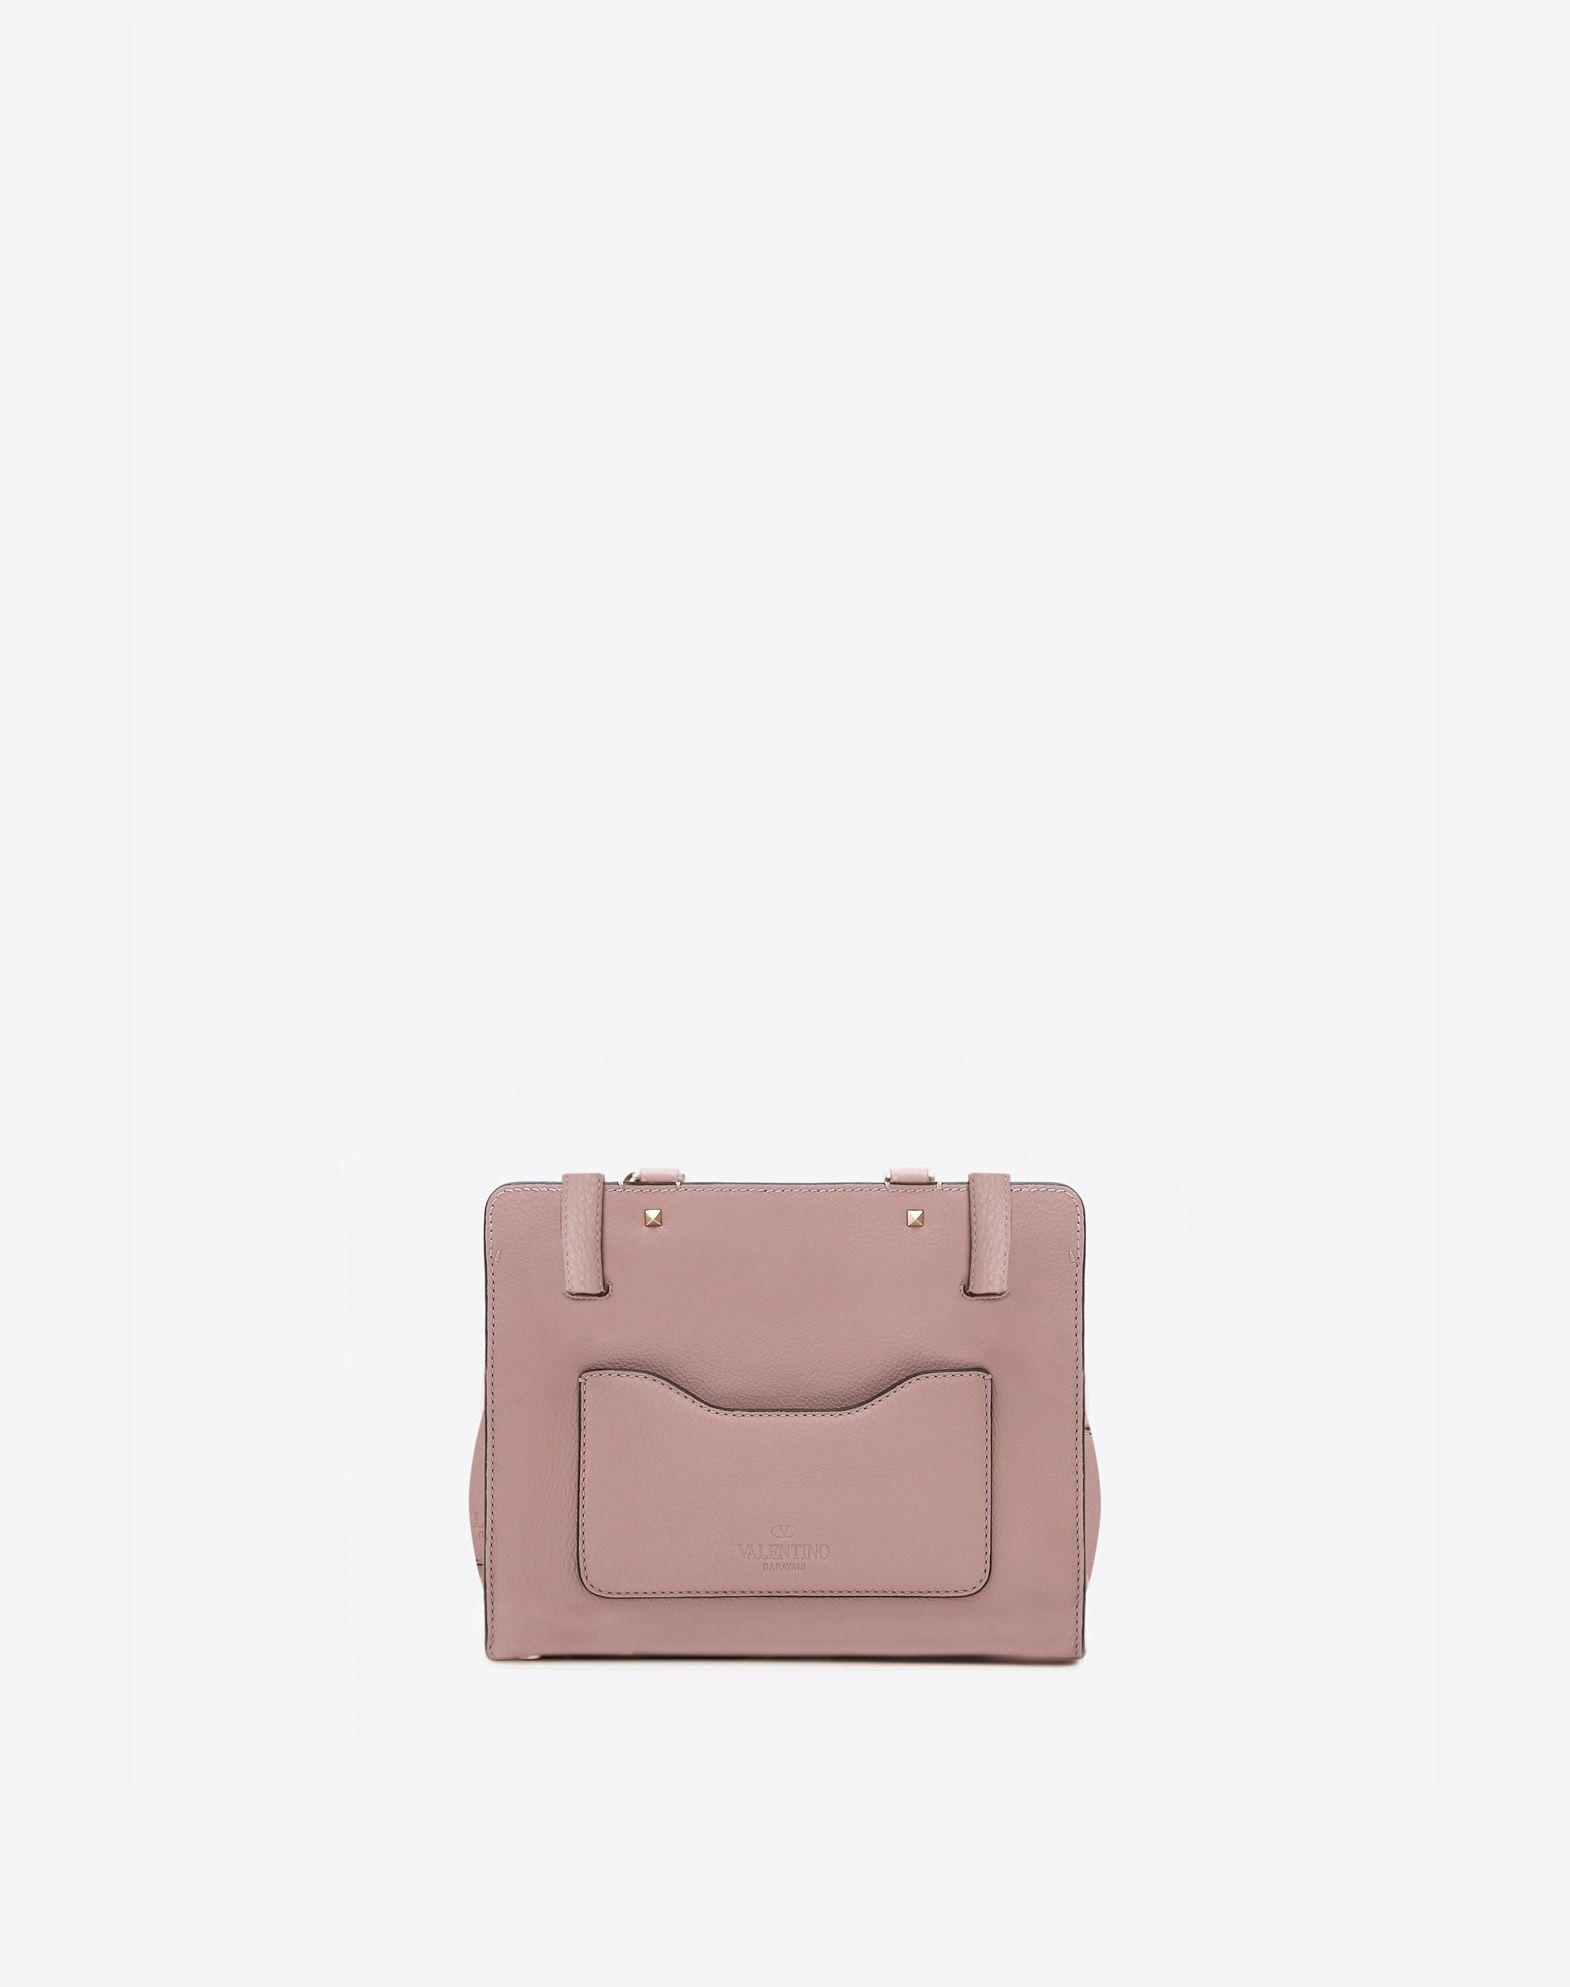 VALENTINO GARAVANI Joylock Medium Handle Bag HANDBAG D d